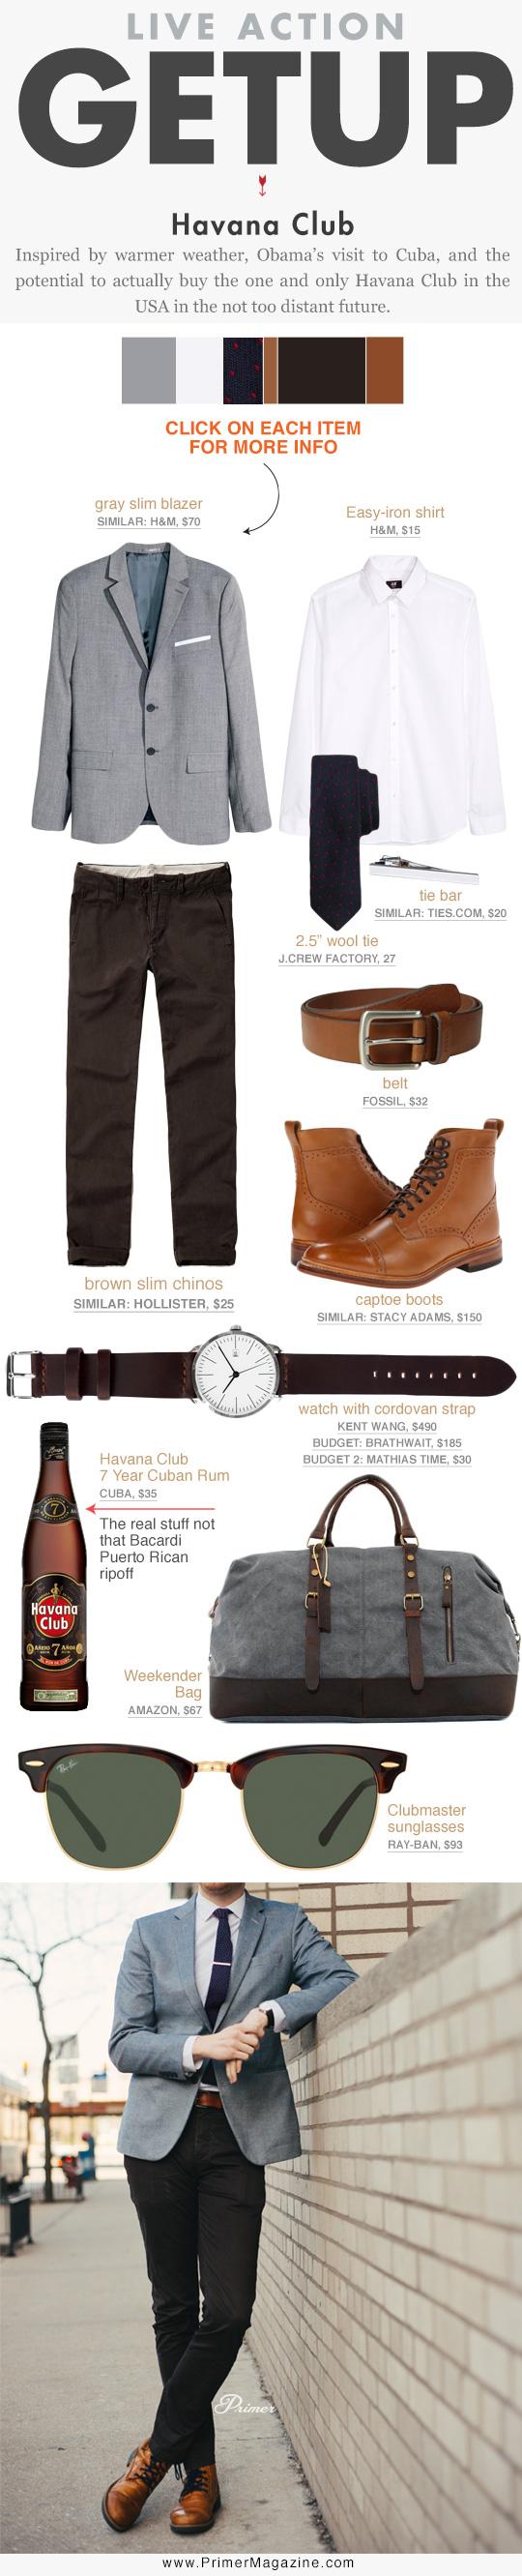 Getup Havana Club - Gray blazer, white shirt and tie, brown pants, and tan boots